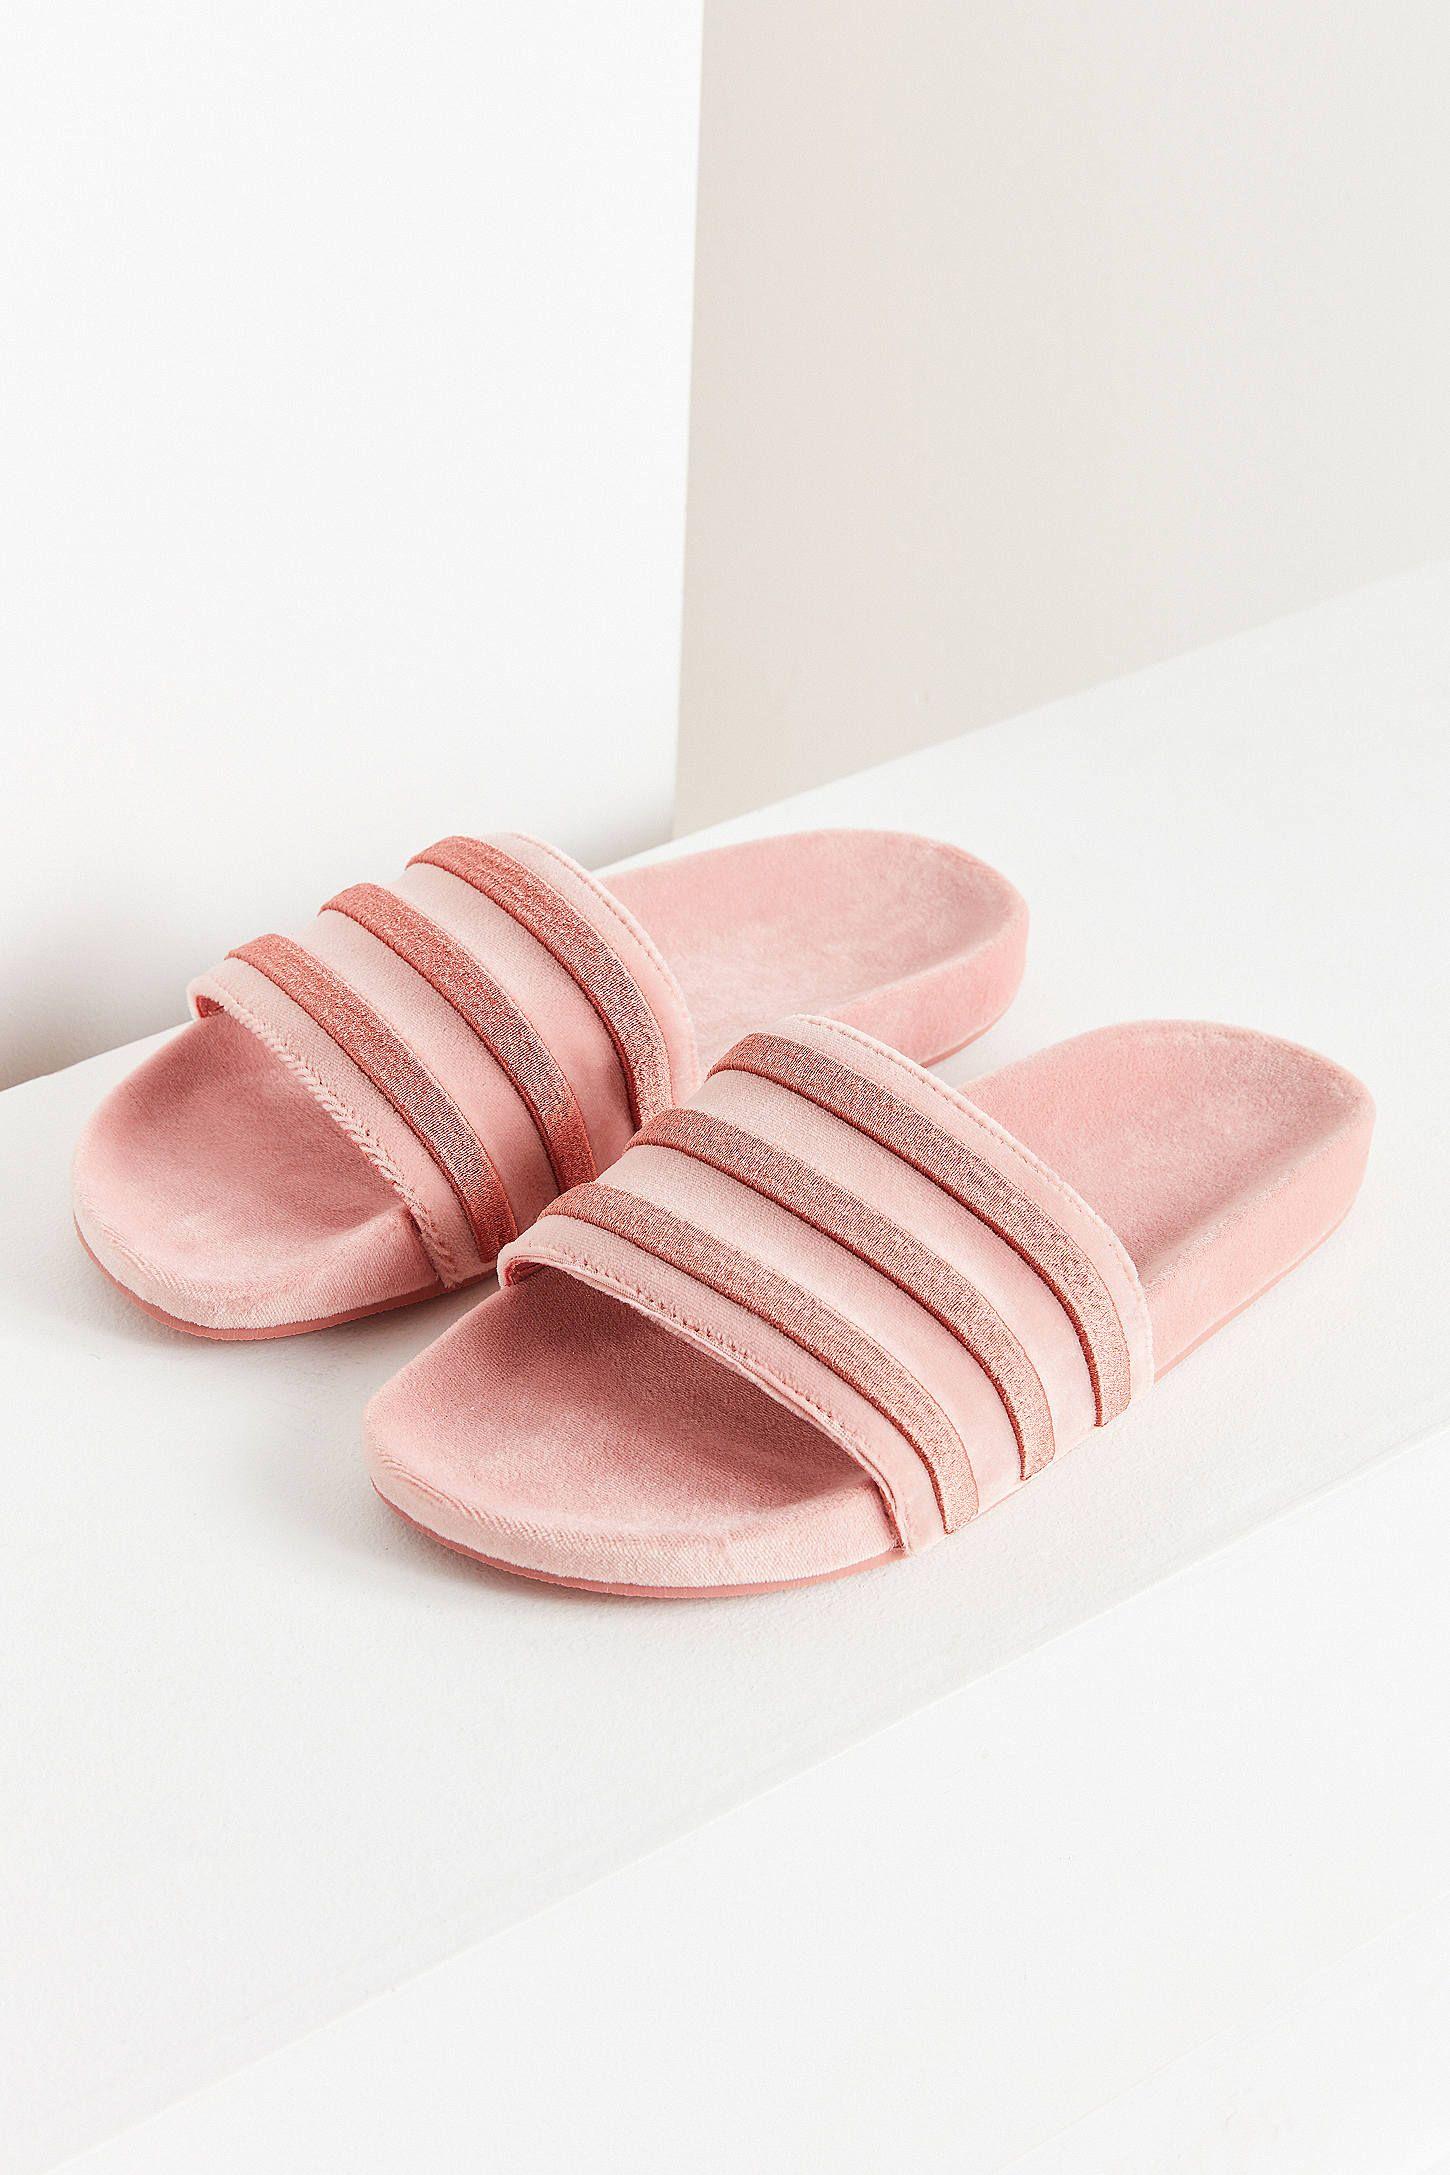 huge discount 4ca73 24415 adidas originals adilette velvet slide. urban outfitters. pink.